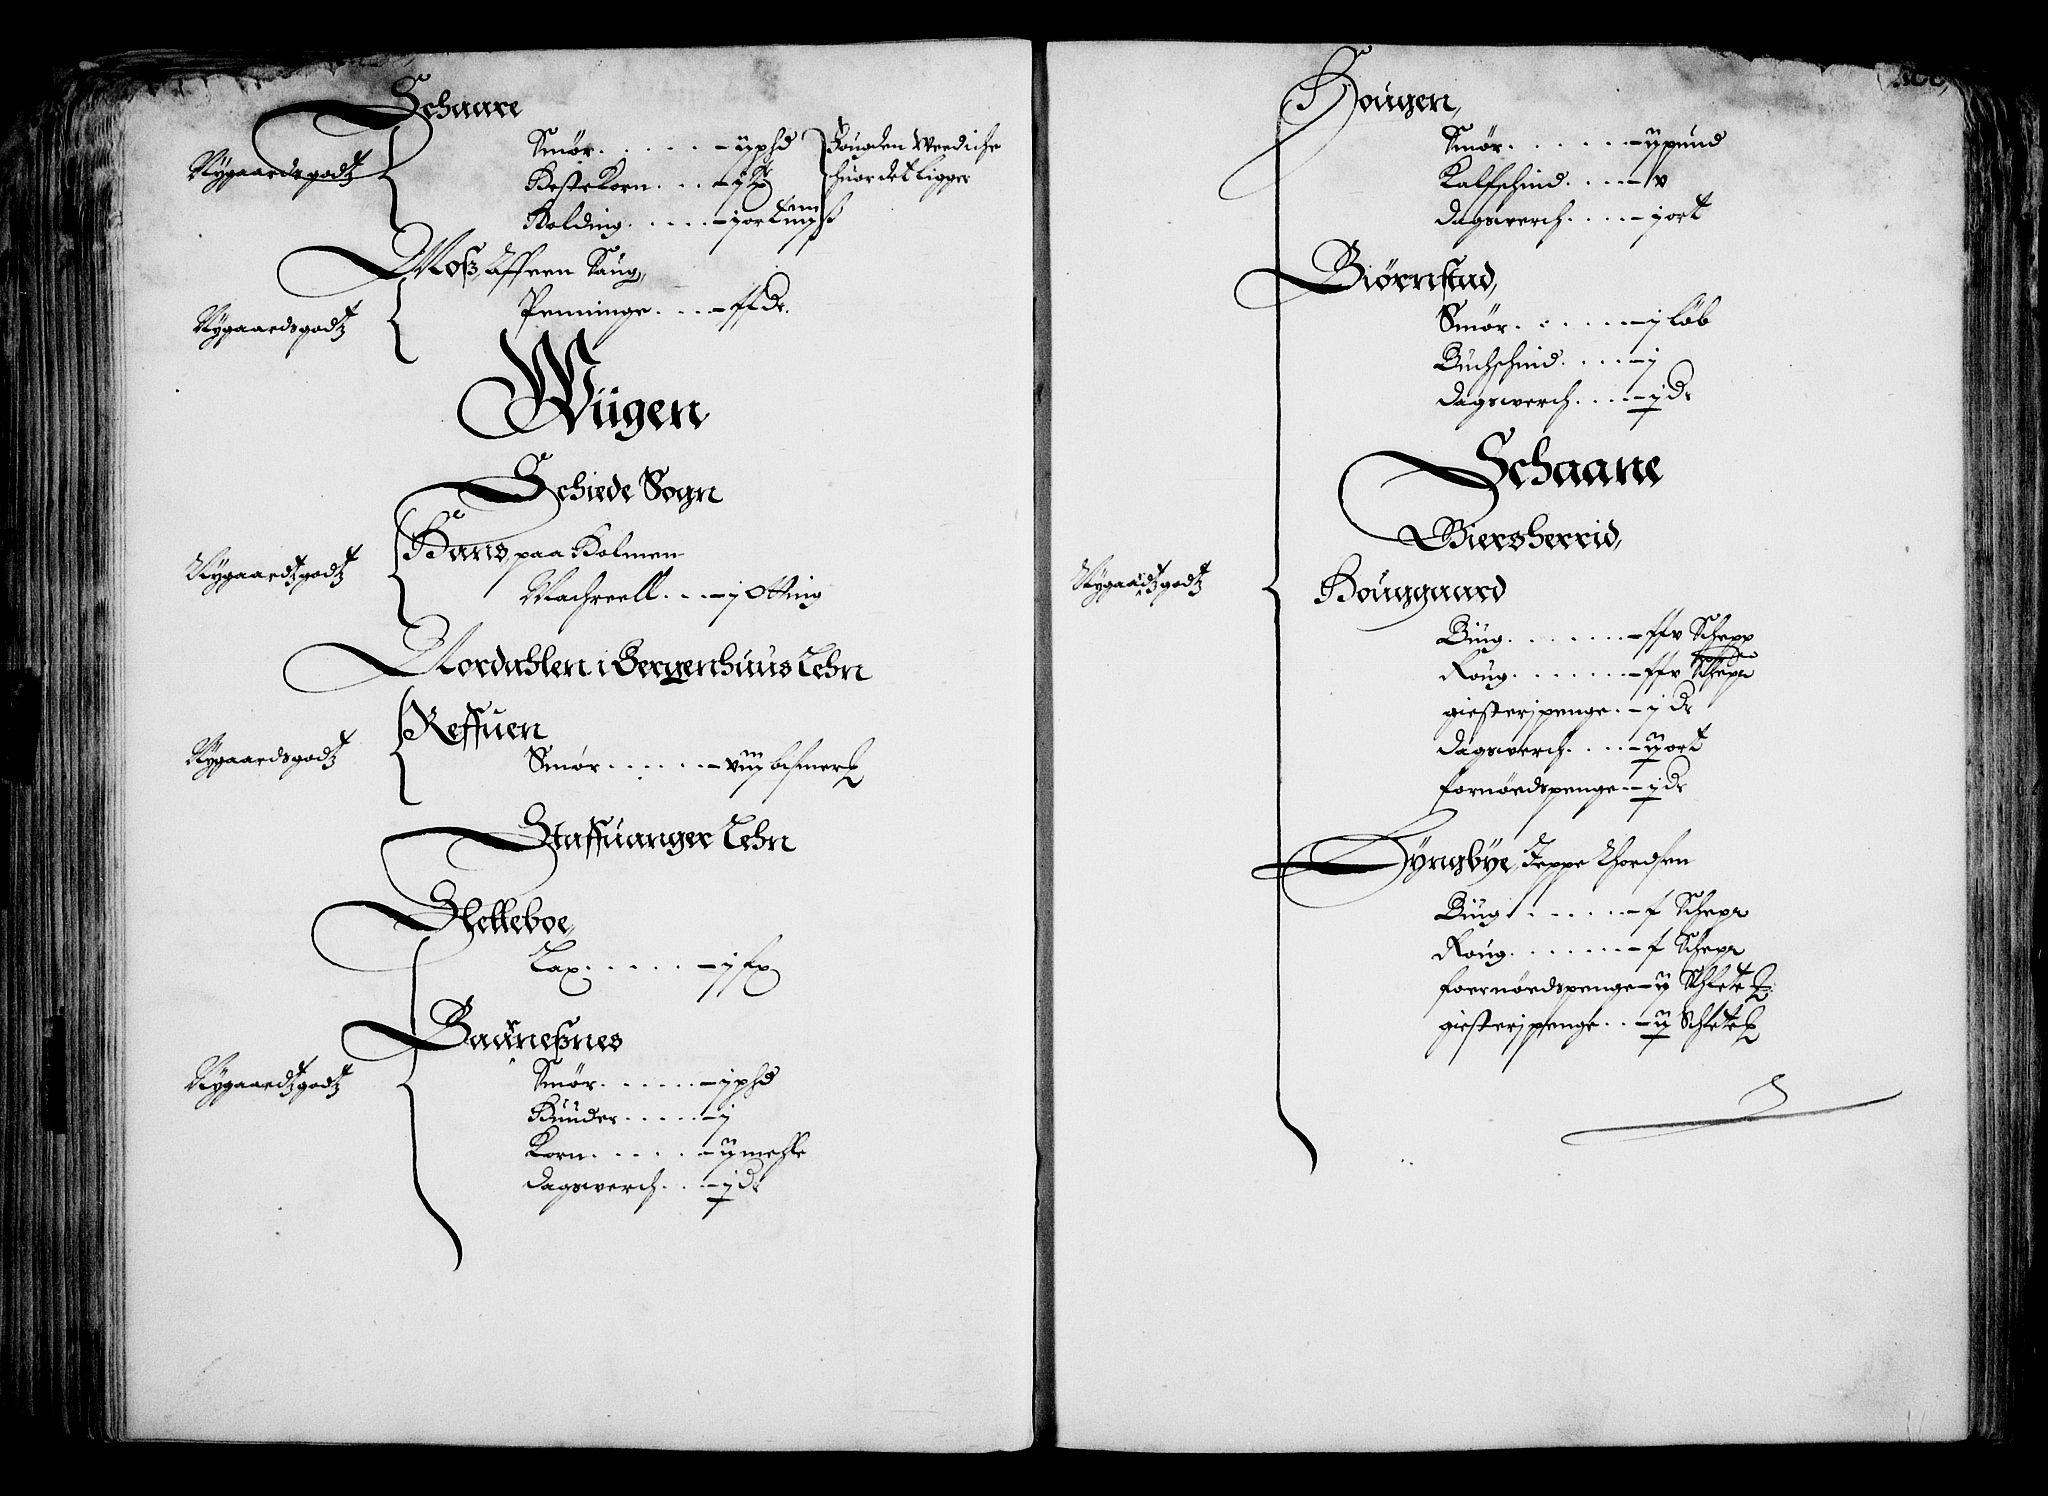 RA, Rentekammeret inntil 1814, Realistisk ordnet avdeling, On/L0001: Statens gods, 1651, s. 159